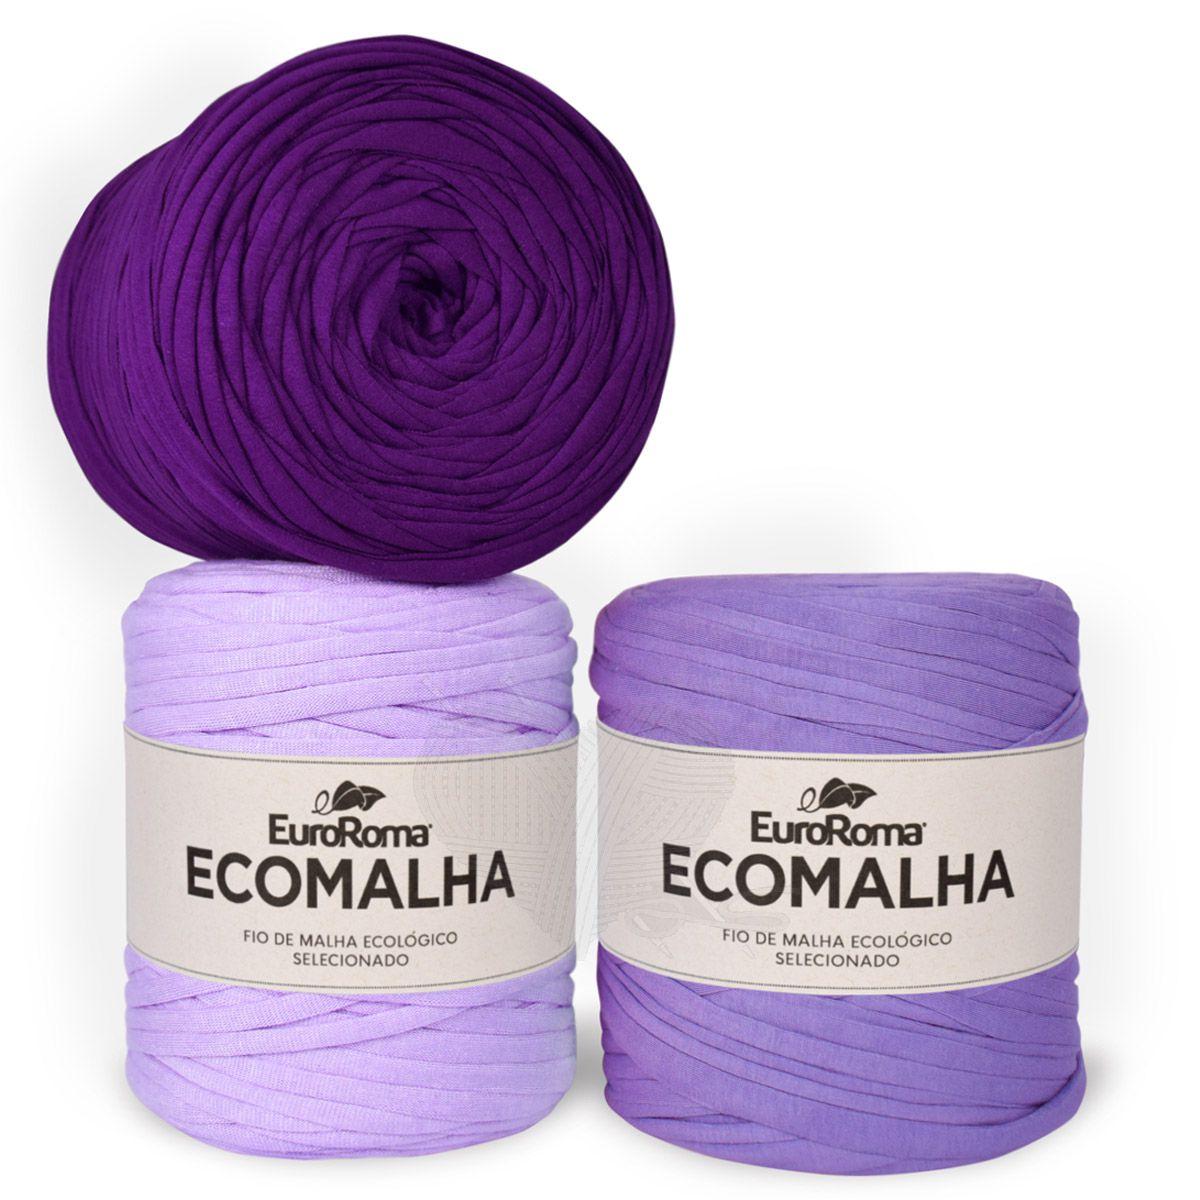 Fio EcoMalha Tons de Violeta - 140m  - Bastex Artesanatos